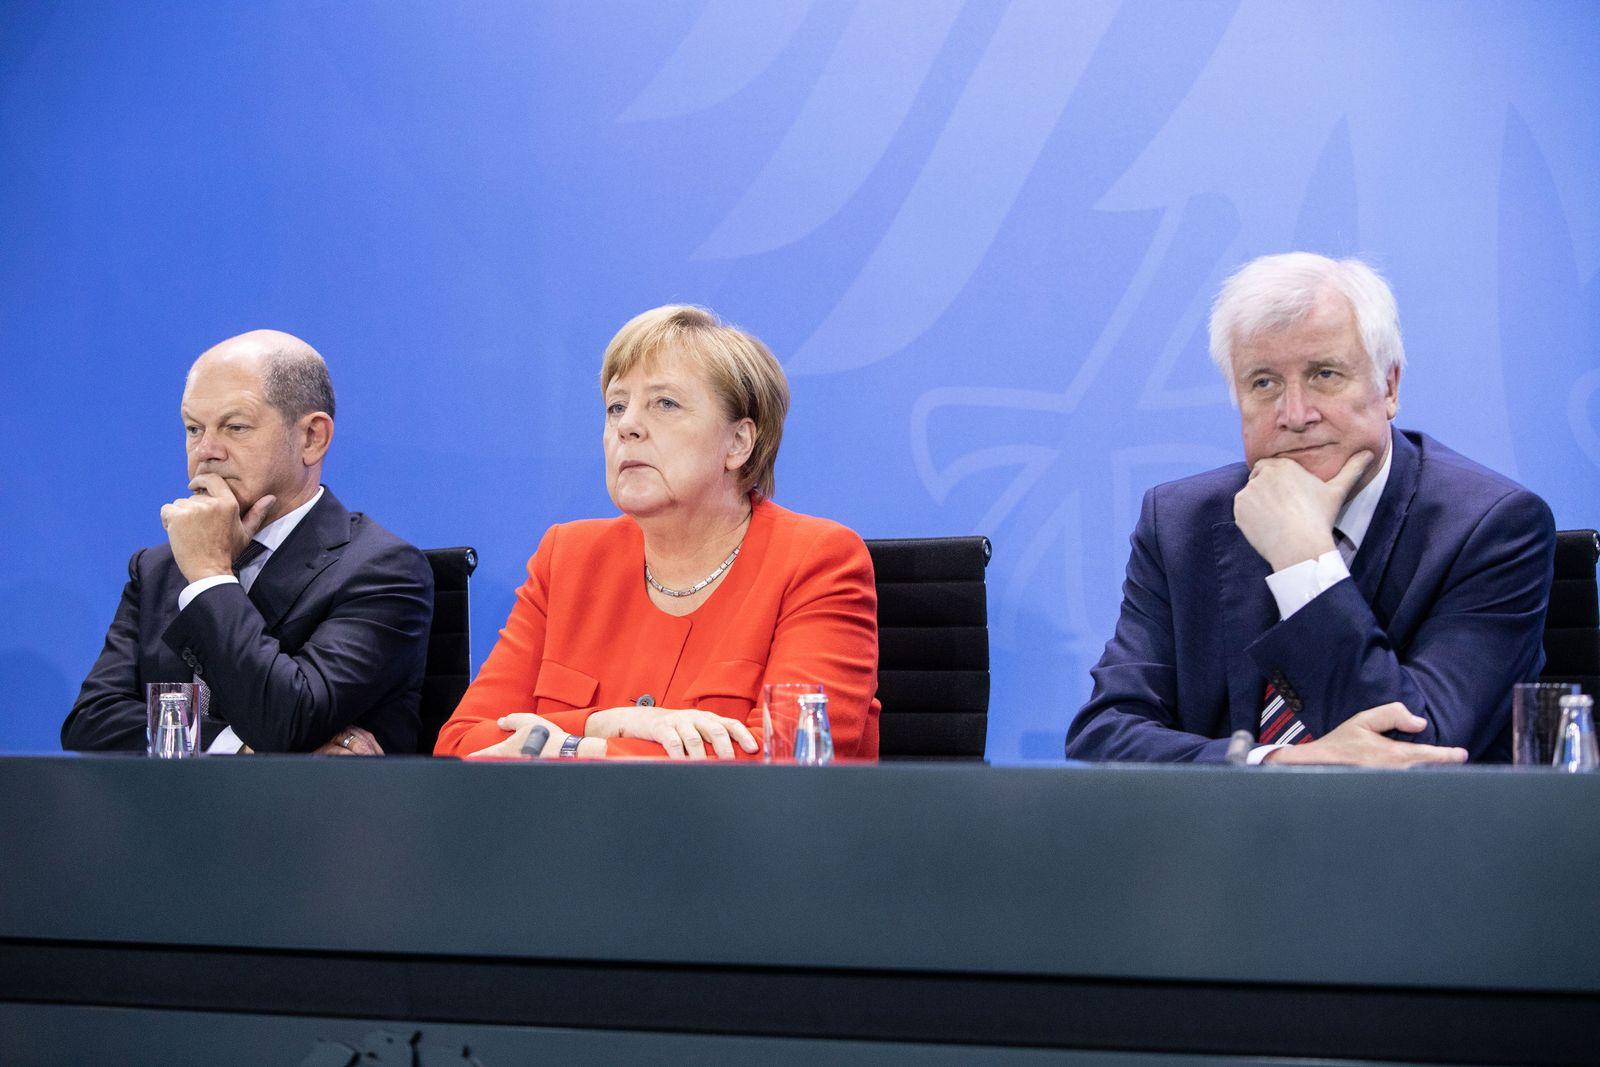 EINMALIGE VERWENDUNG Angela Merkel/ Horst Seehofer/ Olaf Scholz